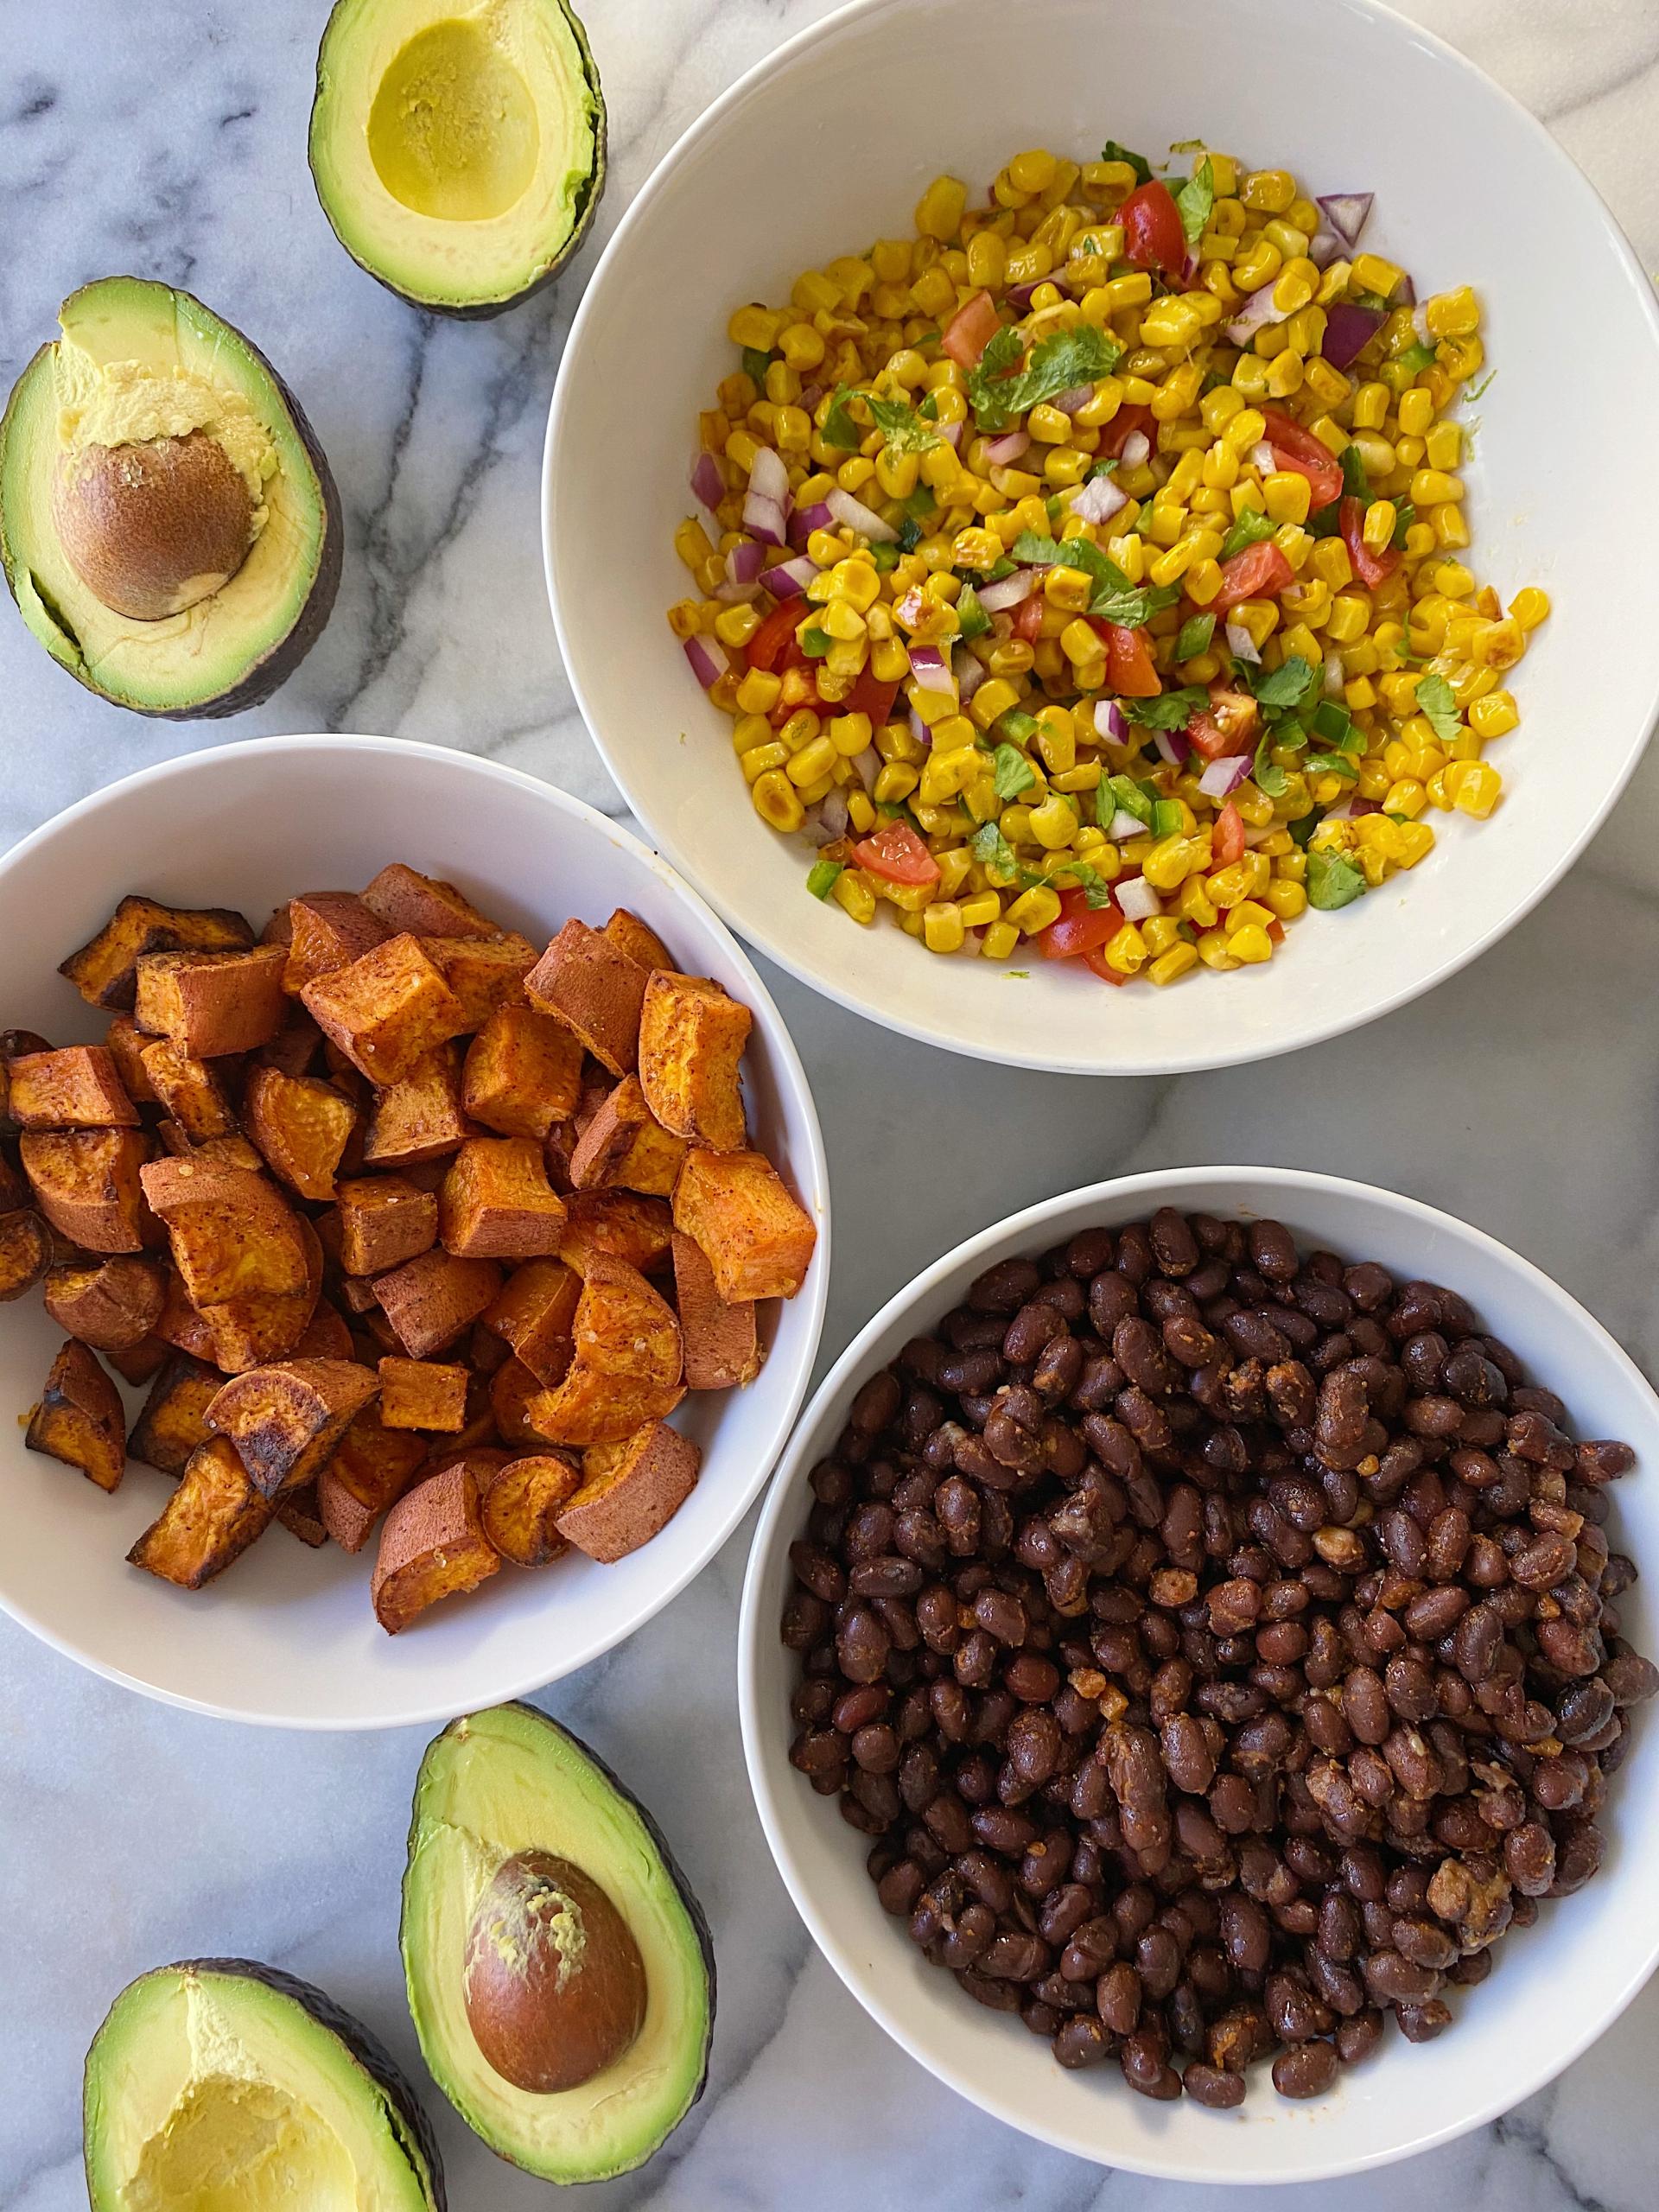 Black Bean Sweet Potato Tacos Corn Salsa Easy Recipe gluten free www.healthygffamily.com